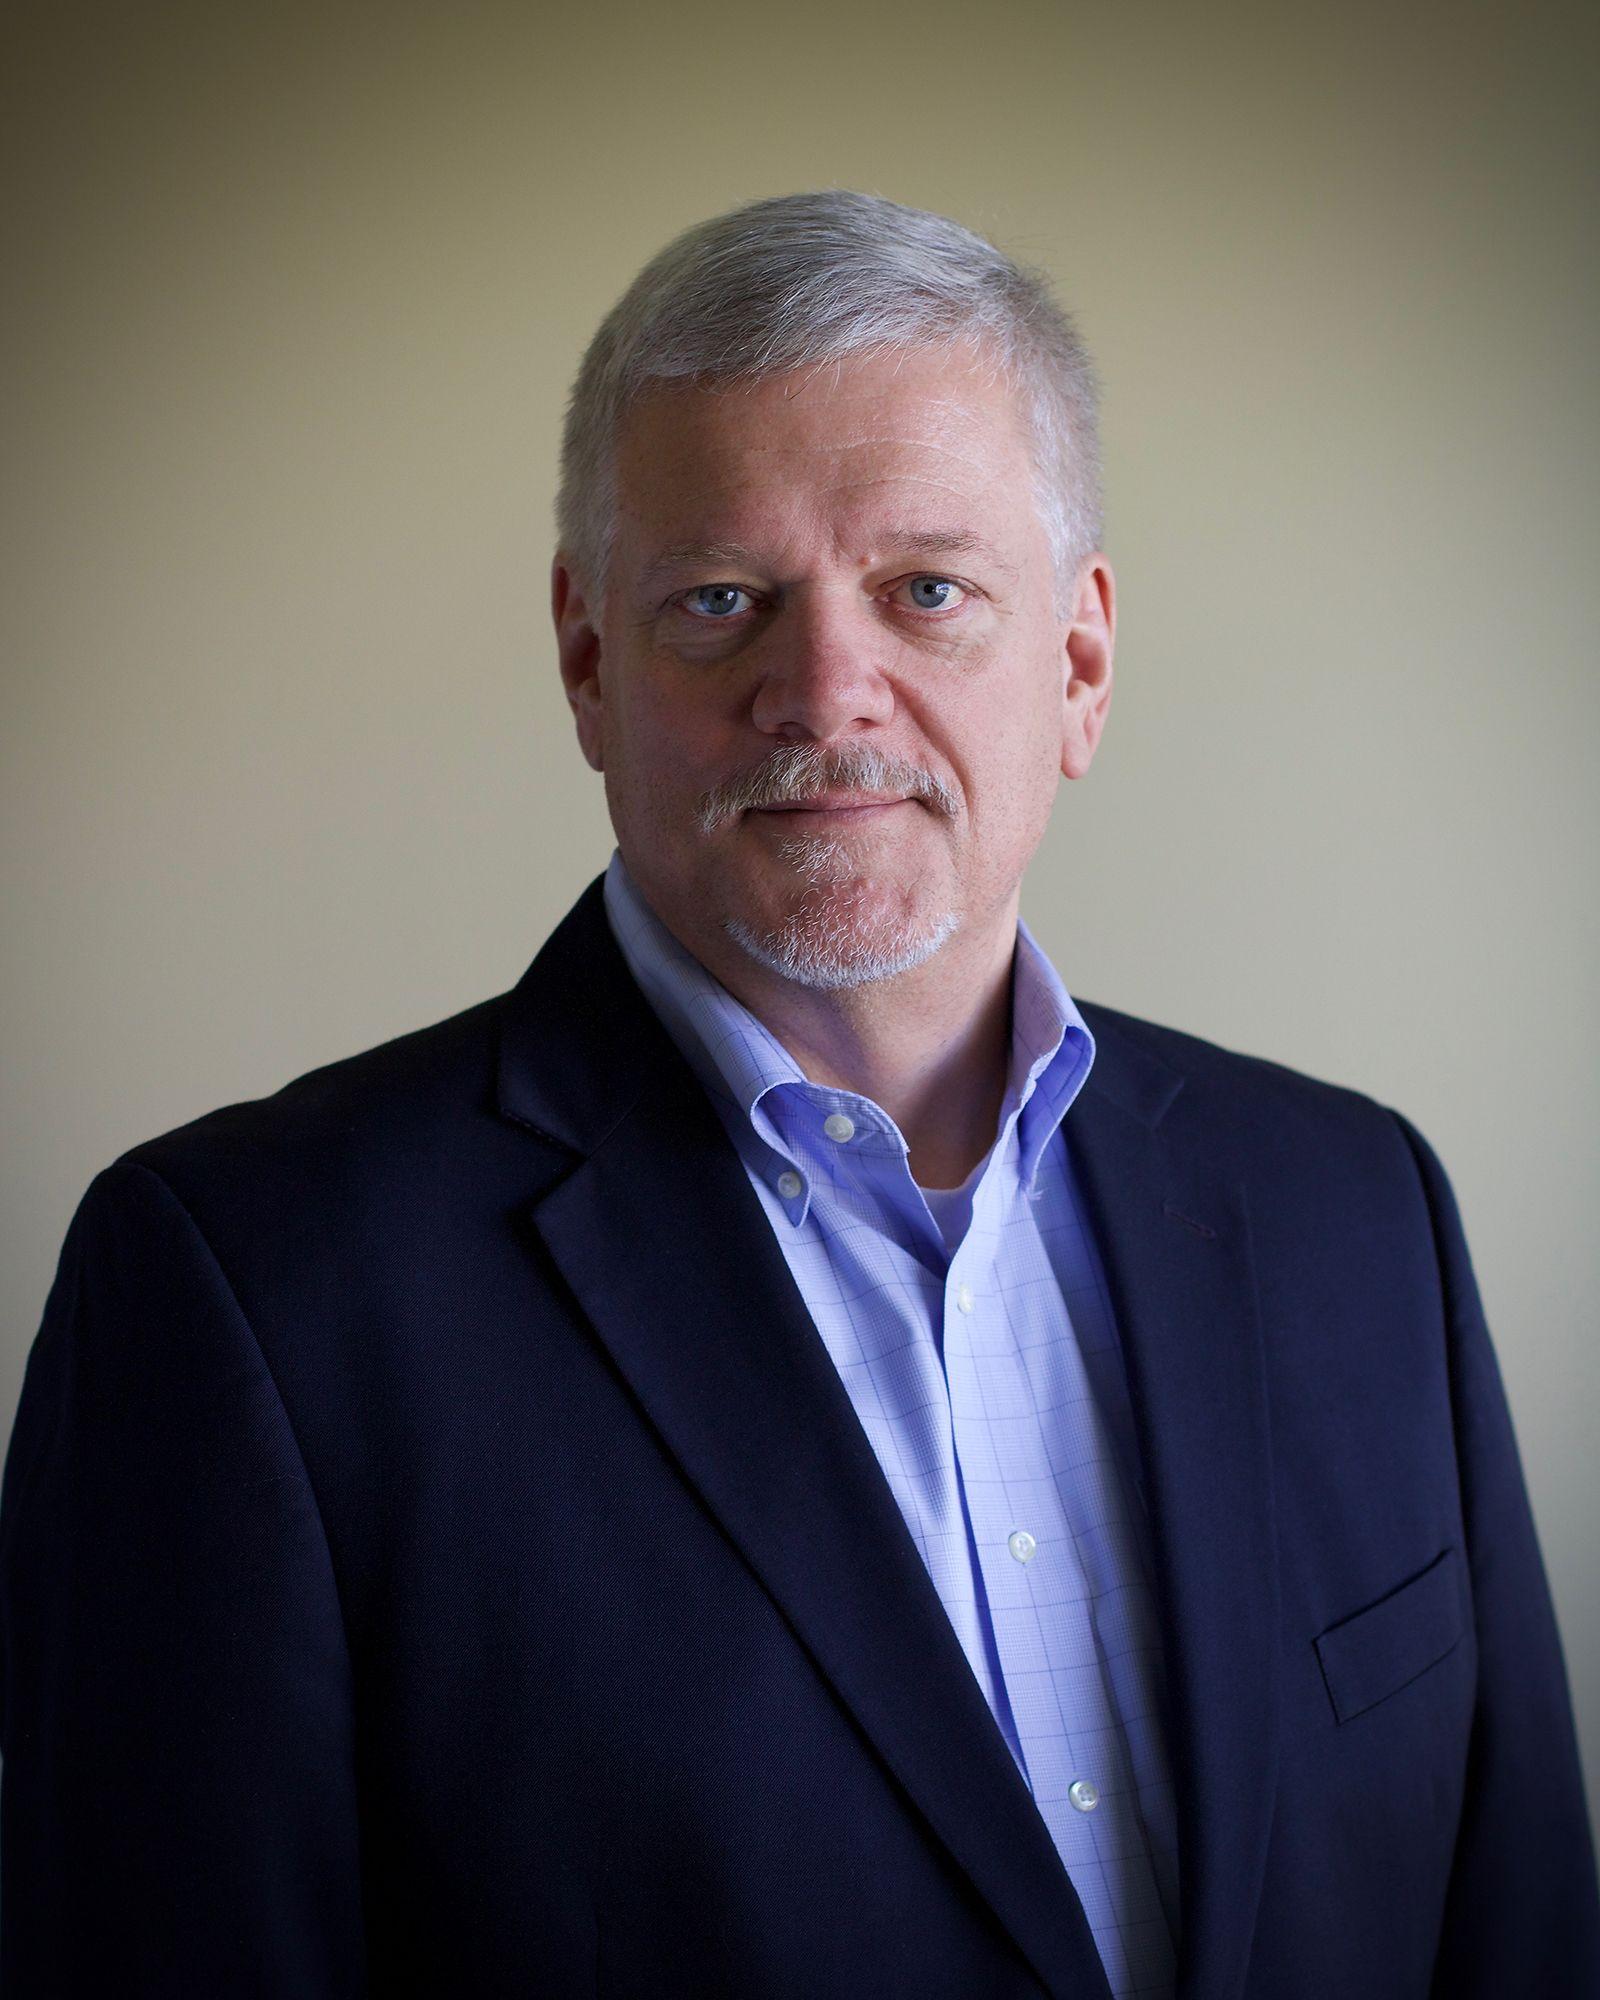 Dave R Taylor Joins Syxsense